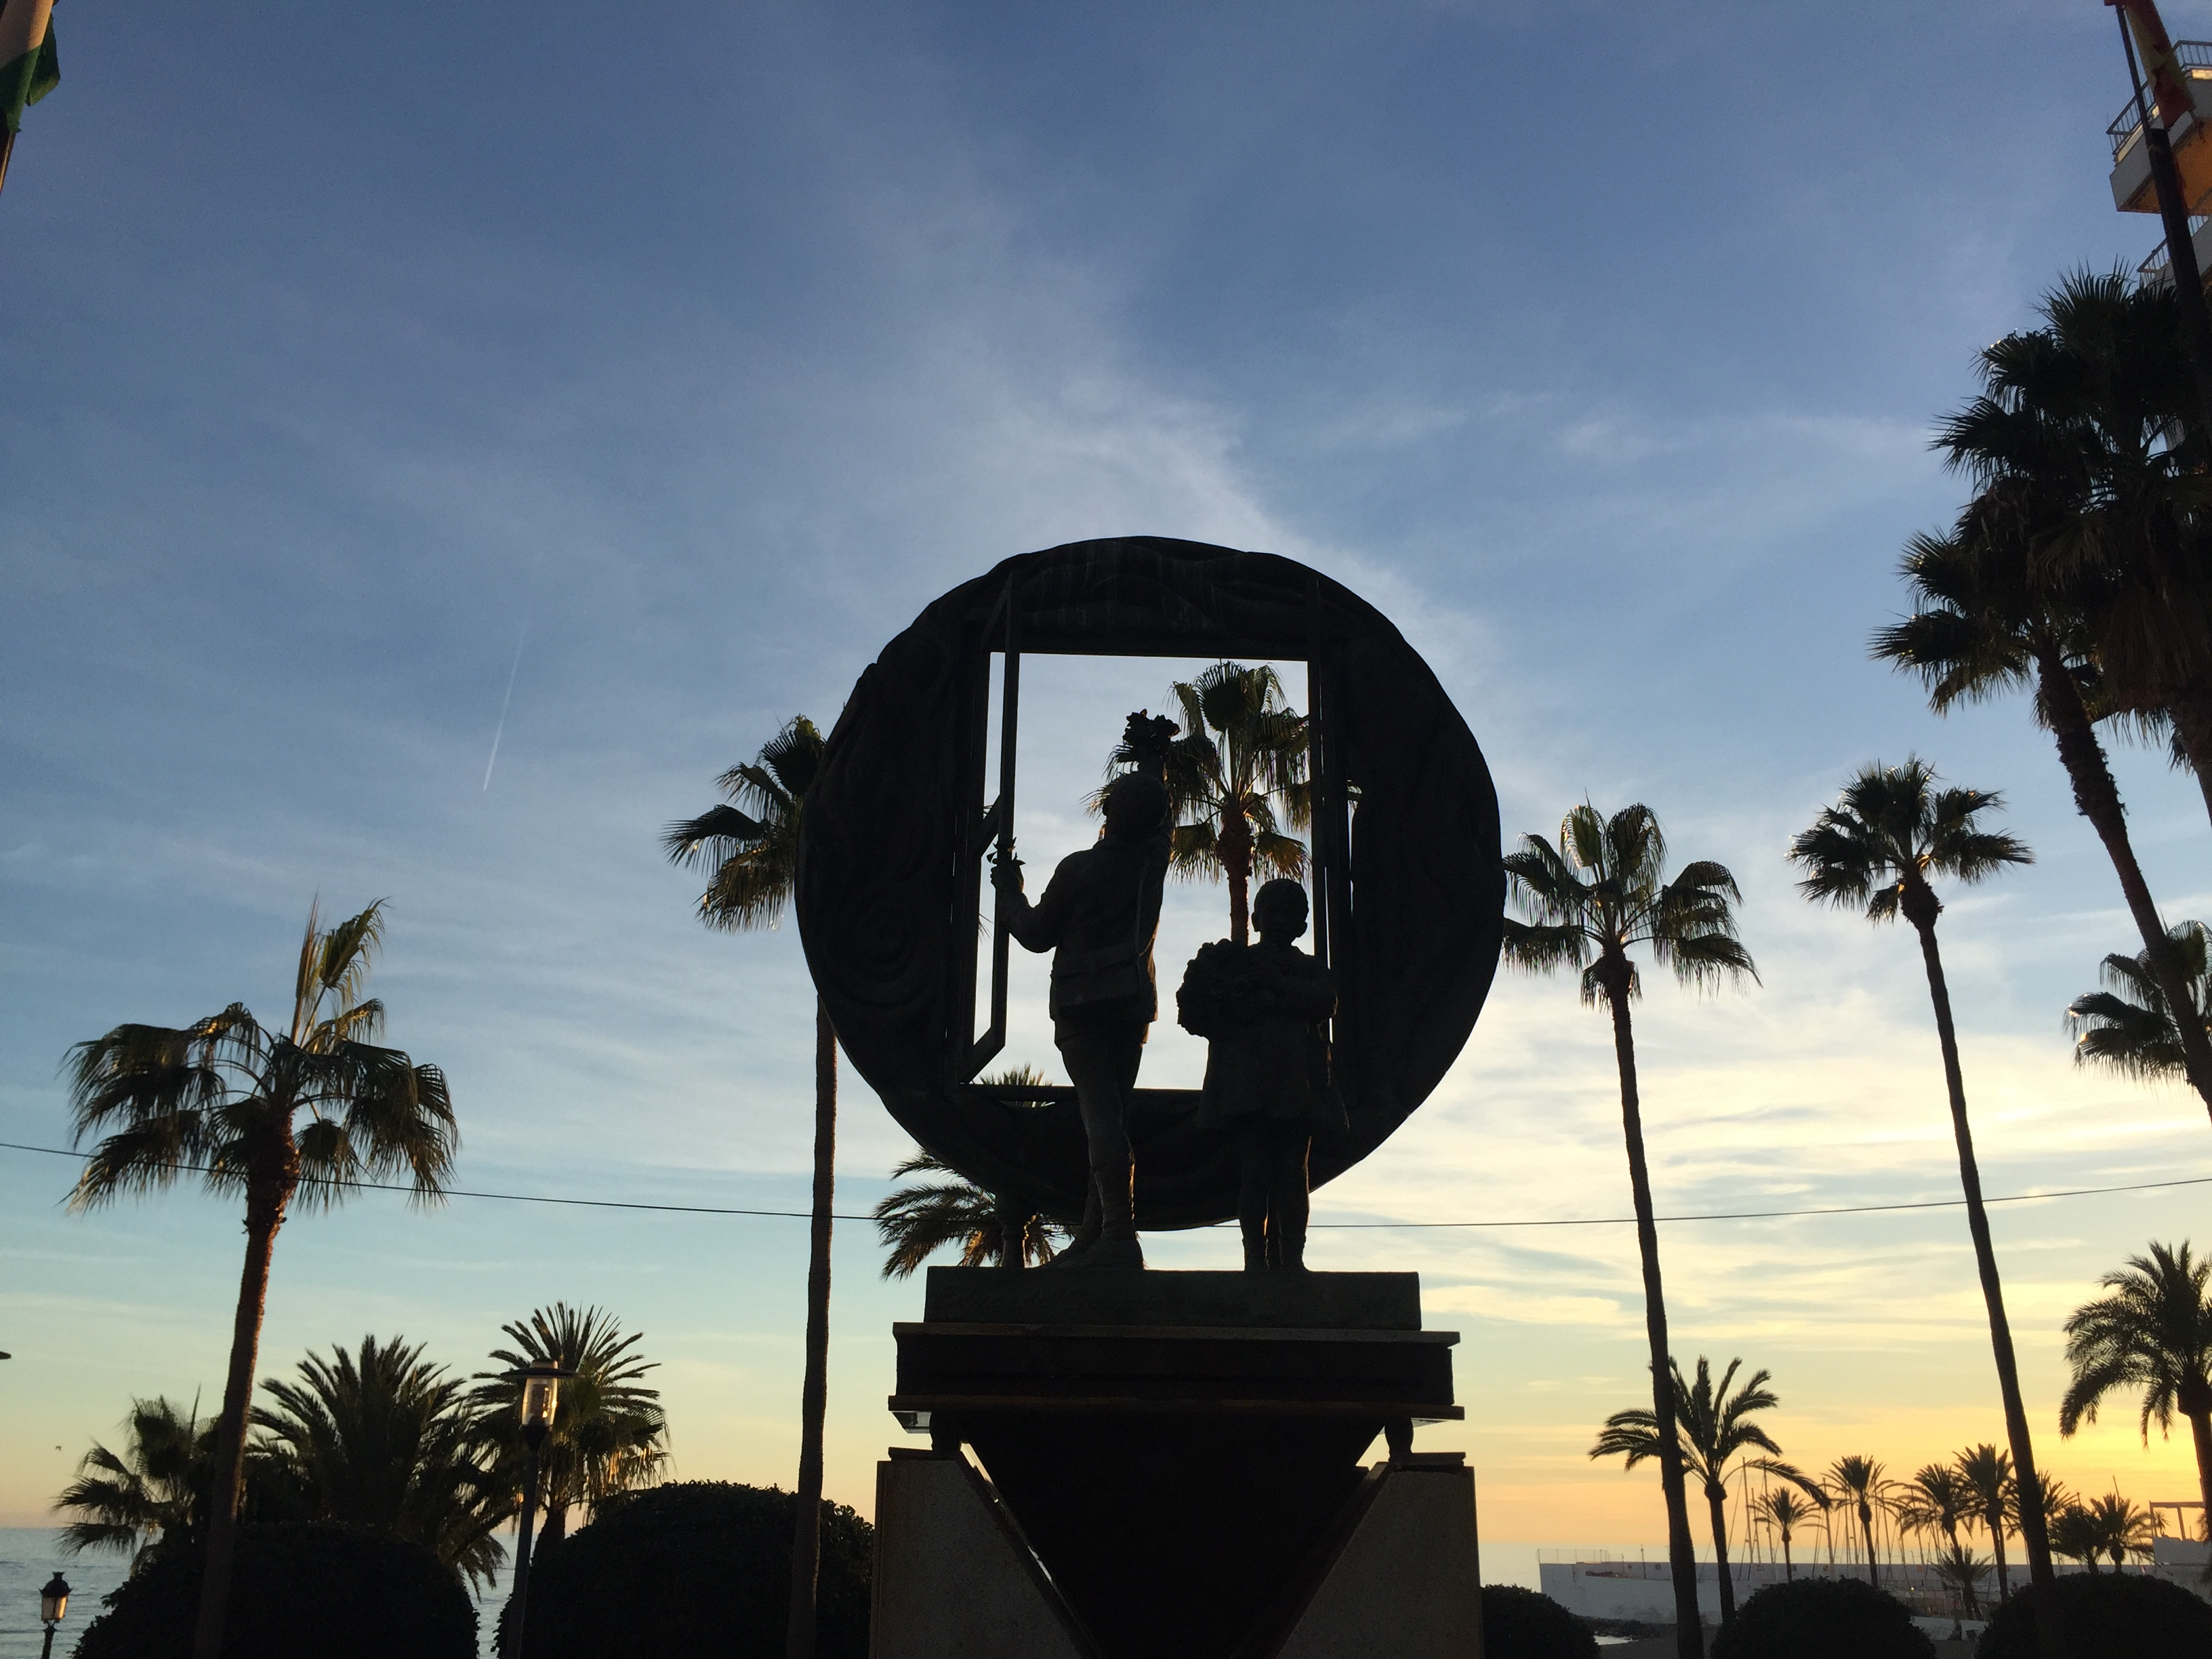 Andalusien knackt 30 Millionen Marke bei Touristen